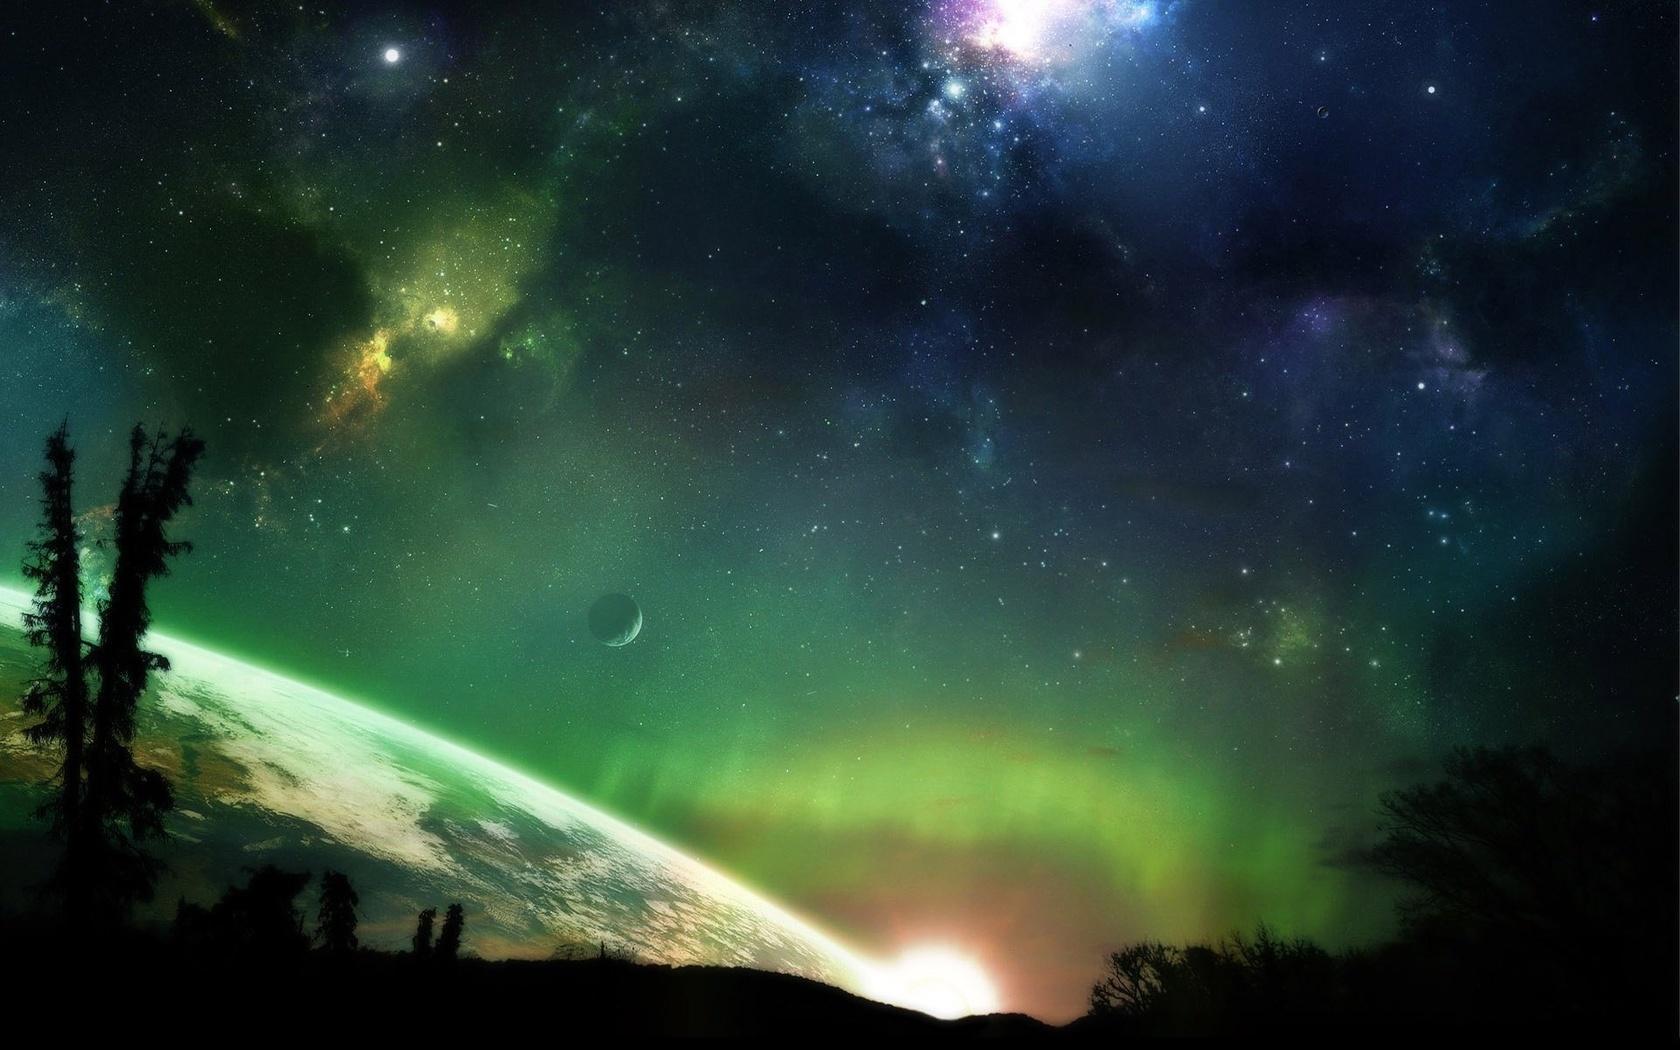 звезды, планета, Aurora borealis, вселенная